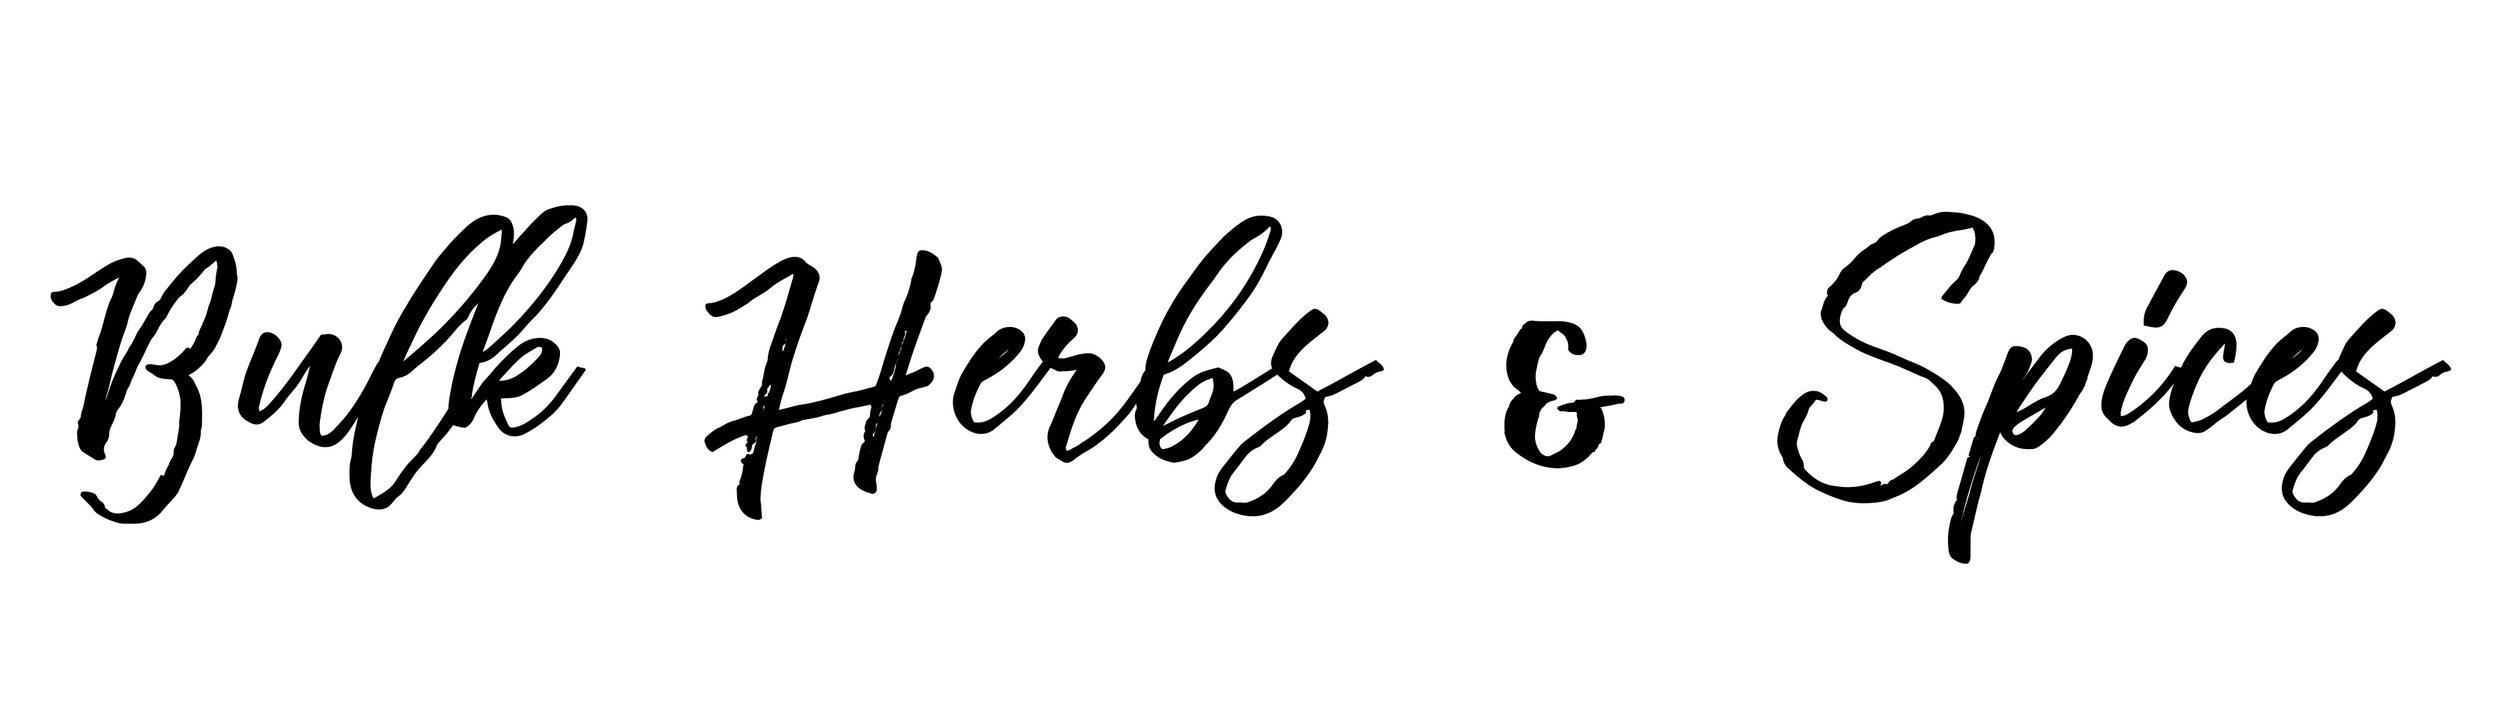 NW bulk herbs & spices.jpg